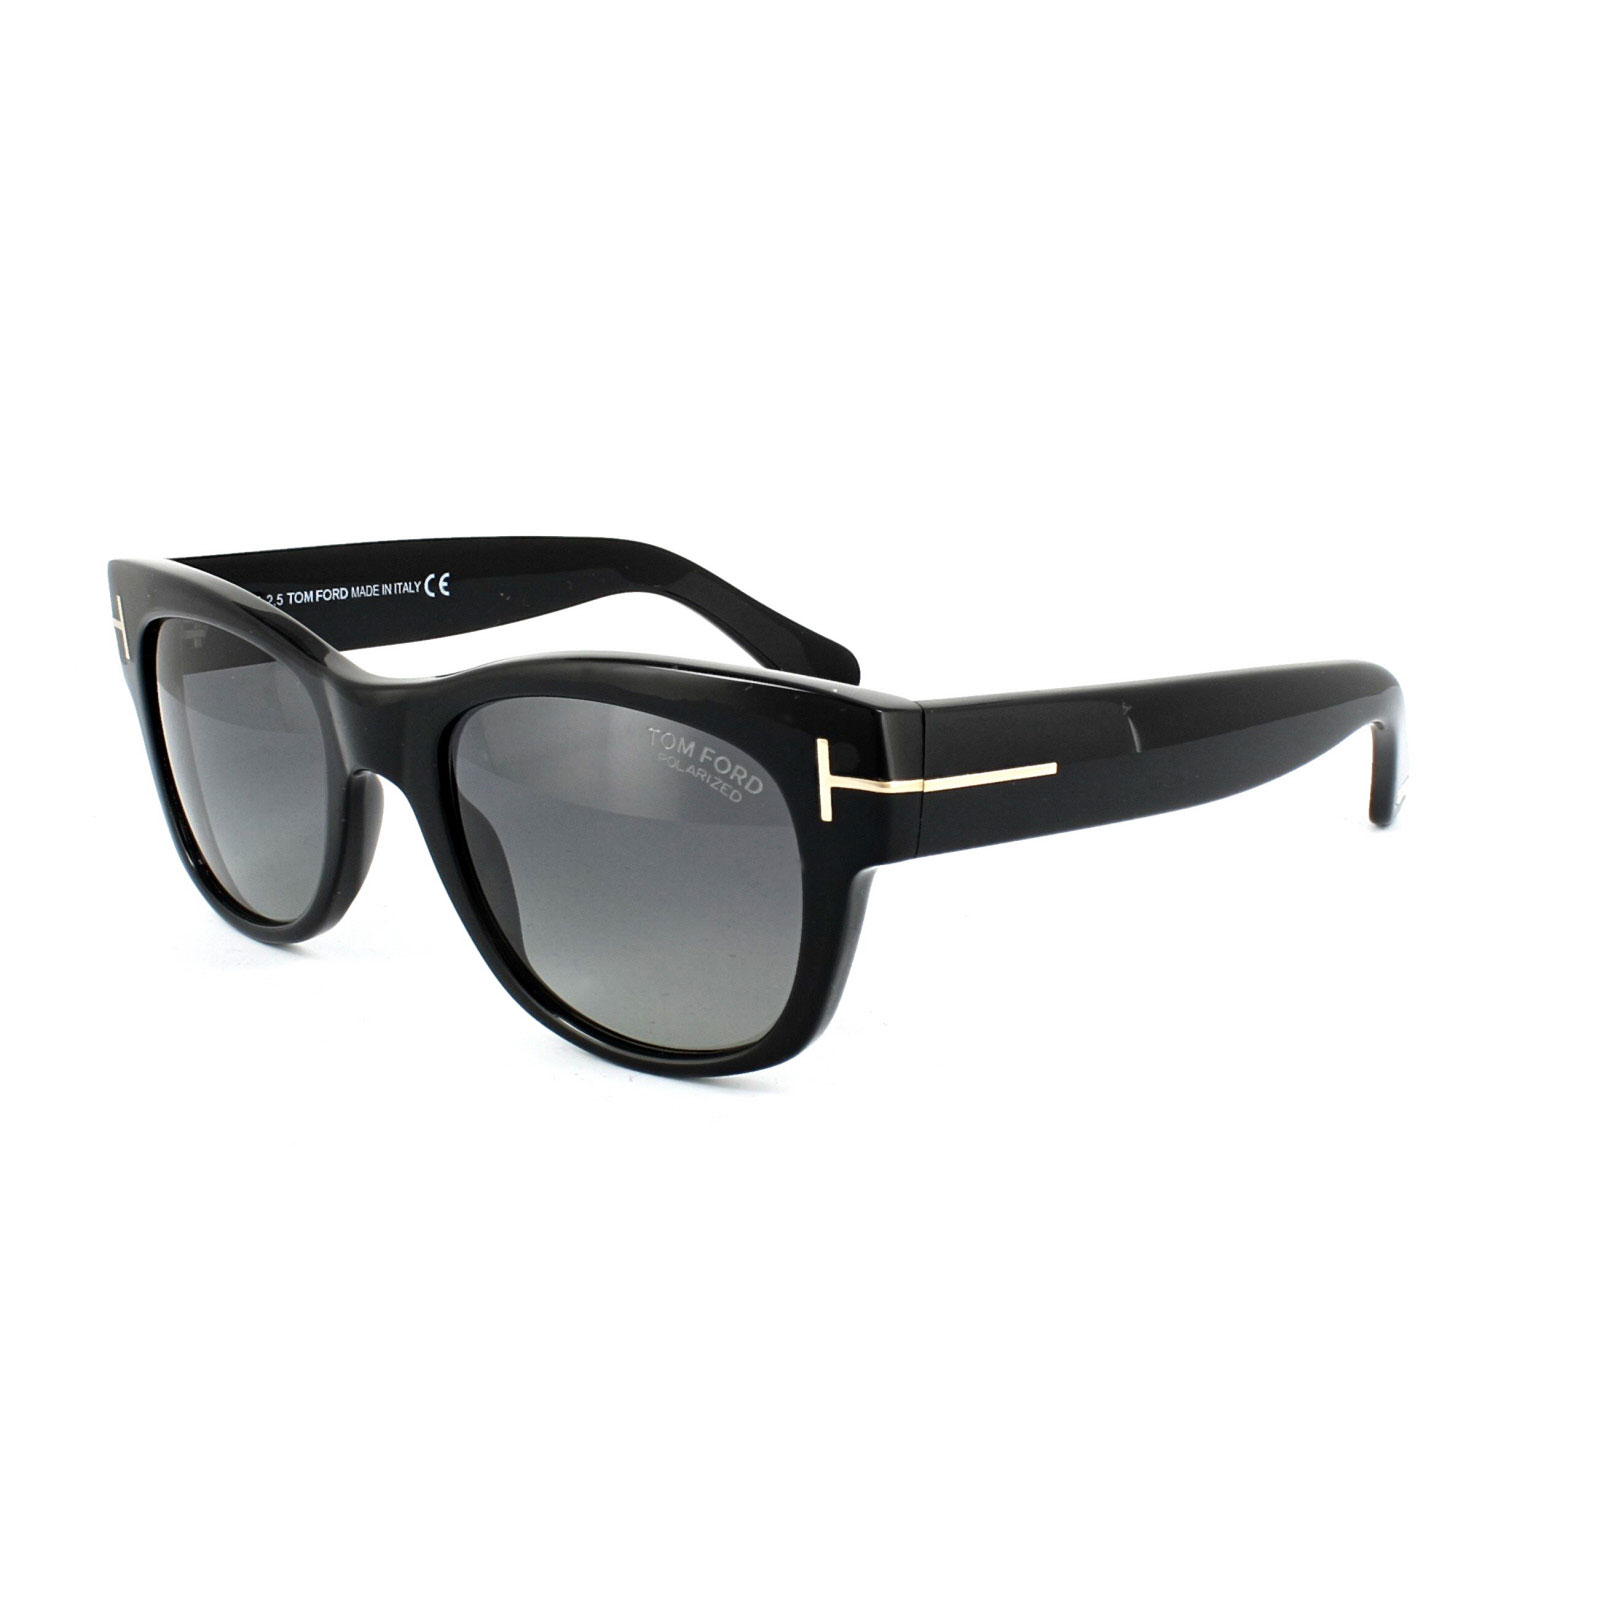 01c04d488ab Sentinel Tom Ford Sunglasses 0058 CARY 01D Shiny Black Smoke Grey Polarized